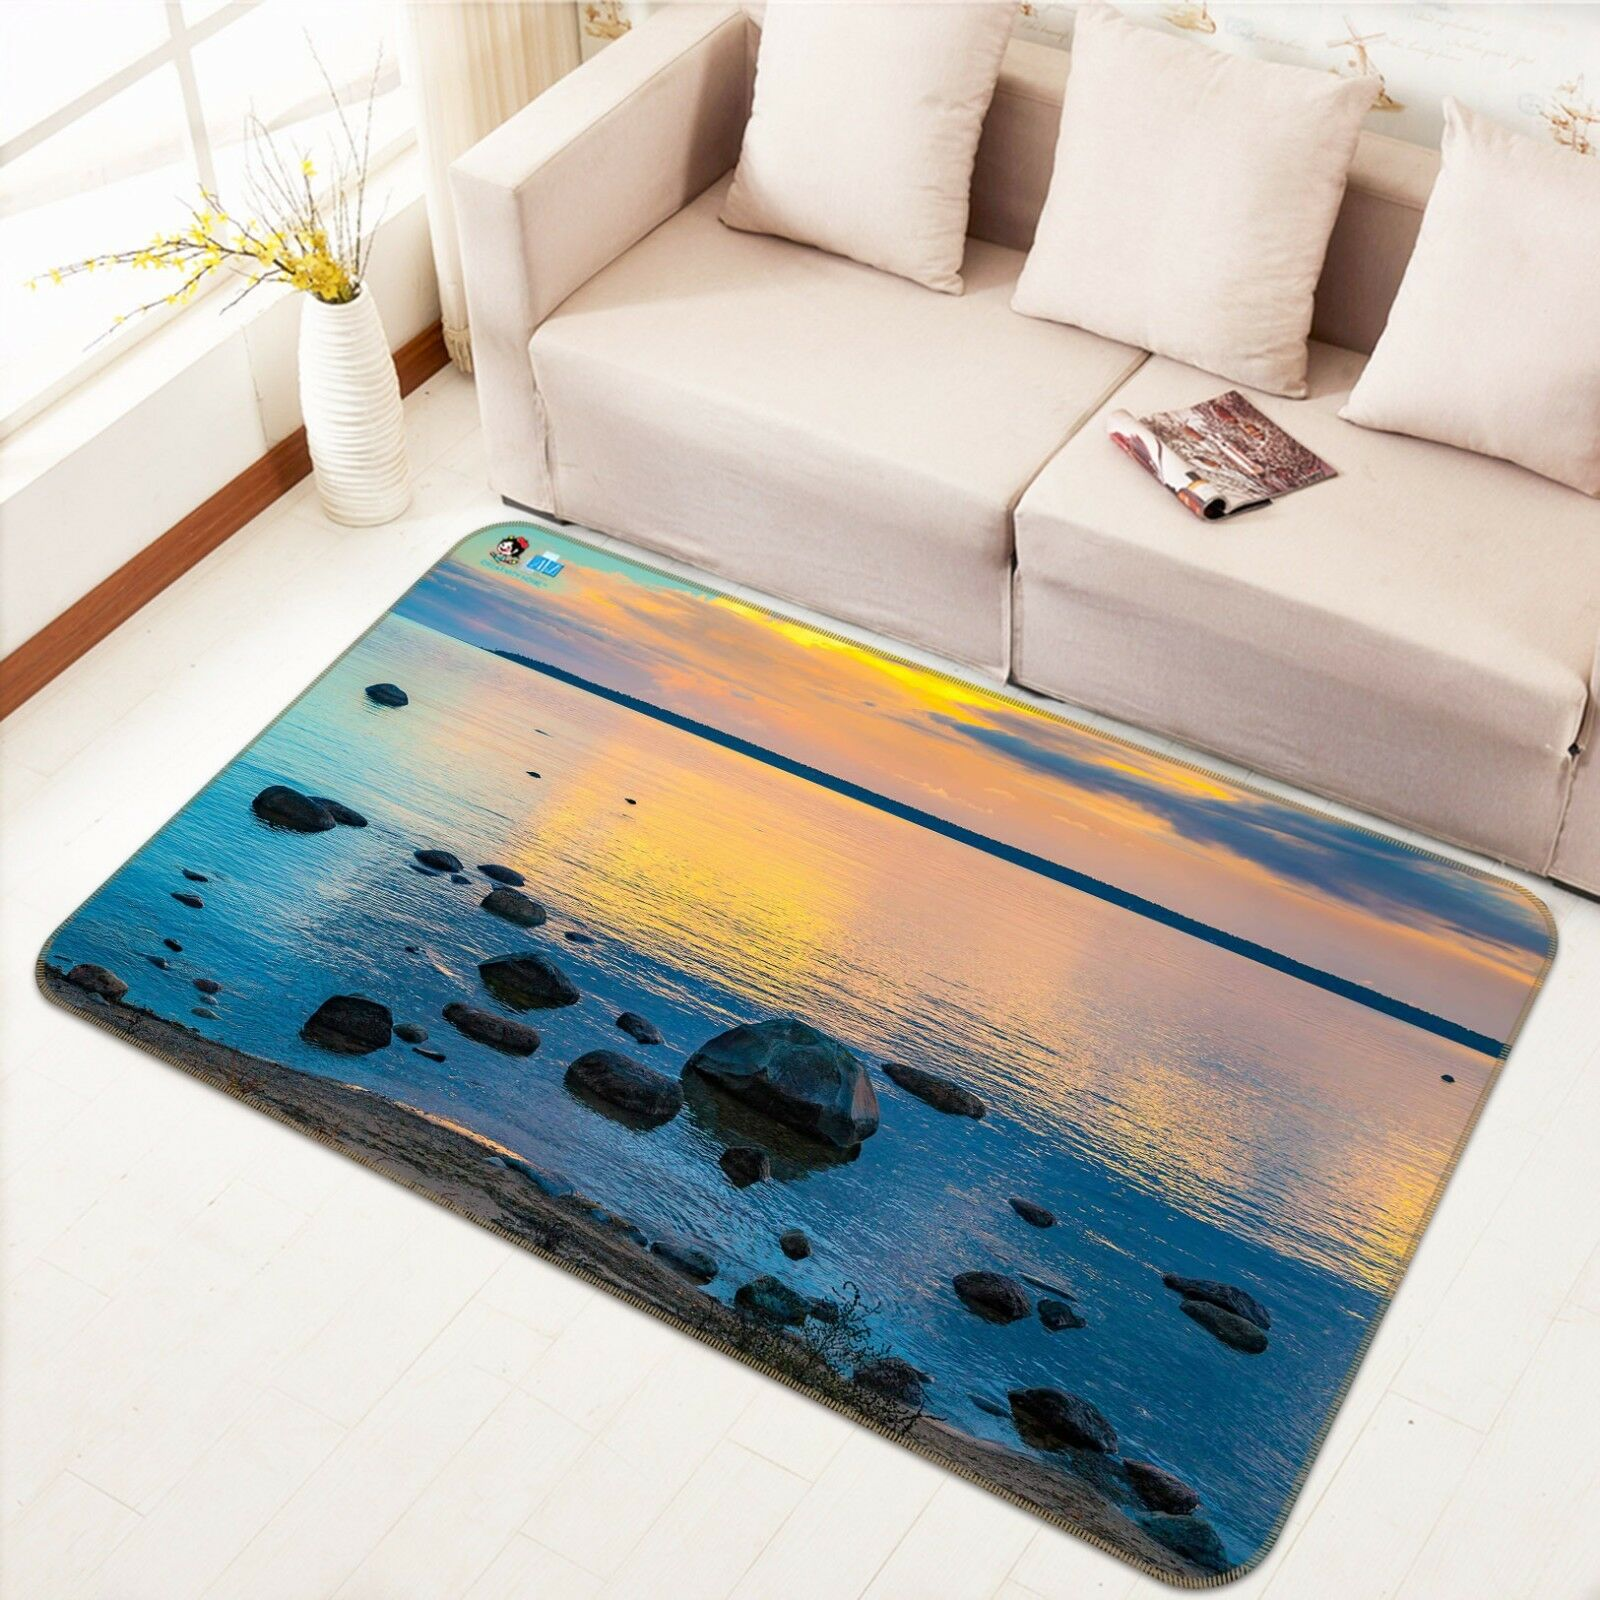 3D Dusk WaterFarbes WaterFarbes WaterFarbes 42 Non Slip Rug Mat Room Mat Quality Elegant Photo Carpet UK 1cb49a